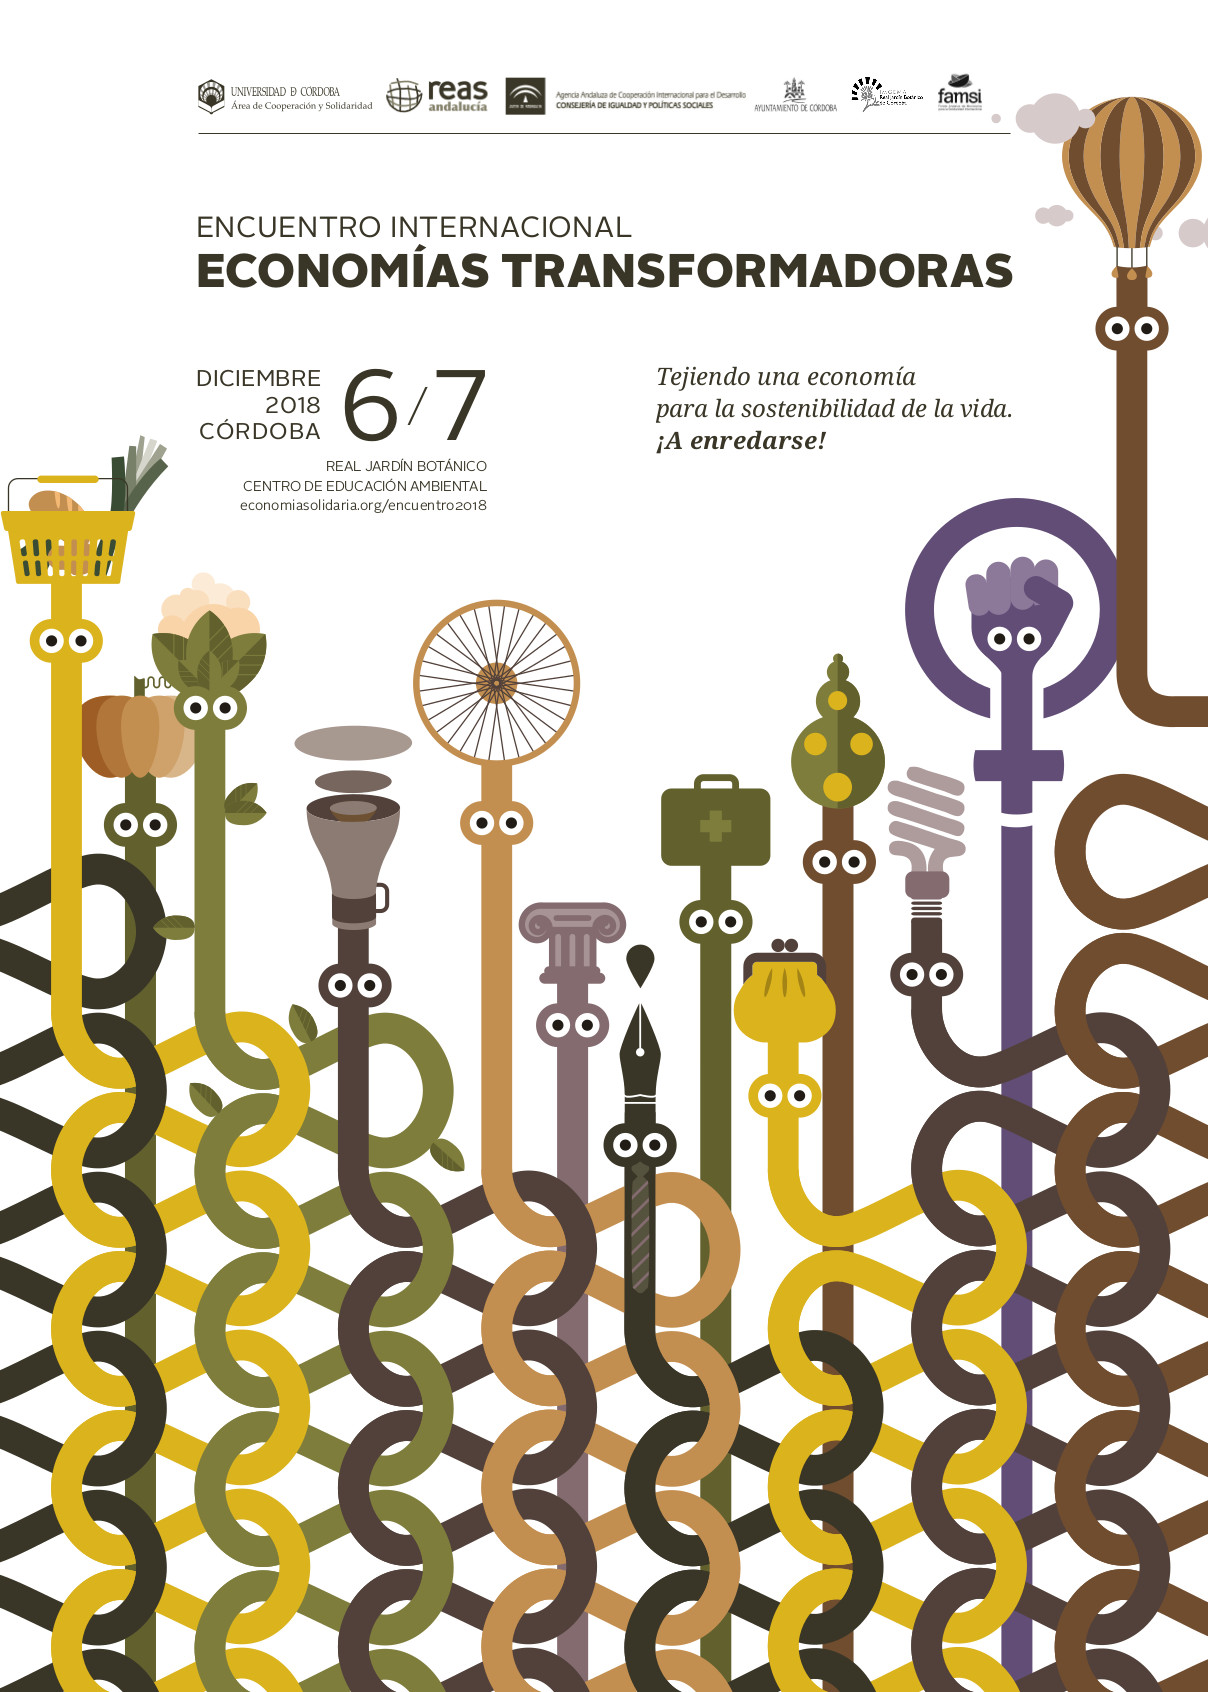 Encuentro Internacional De Economías Transformadoras (Córdoba)